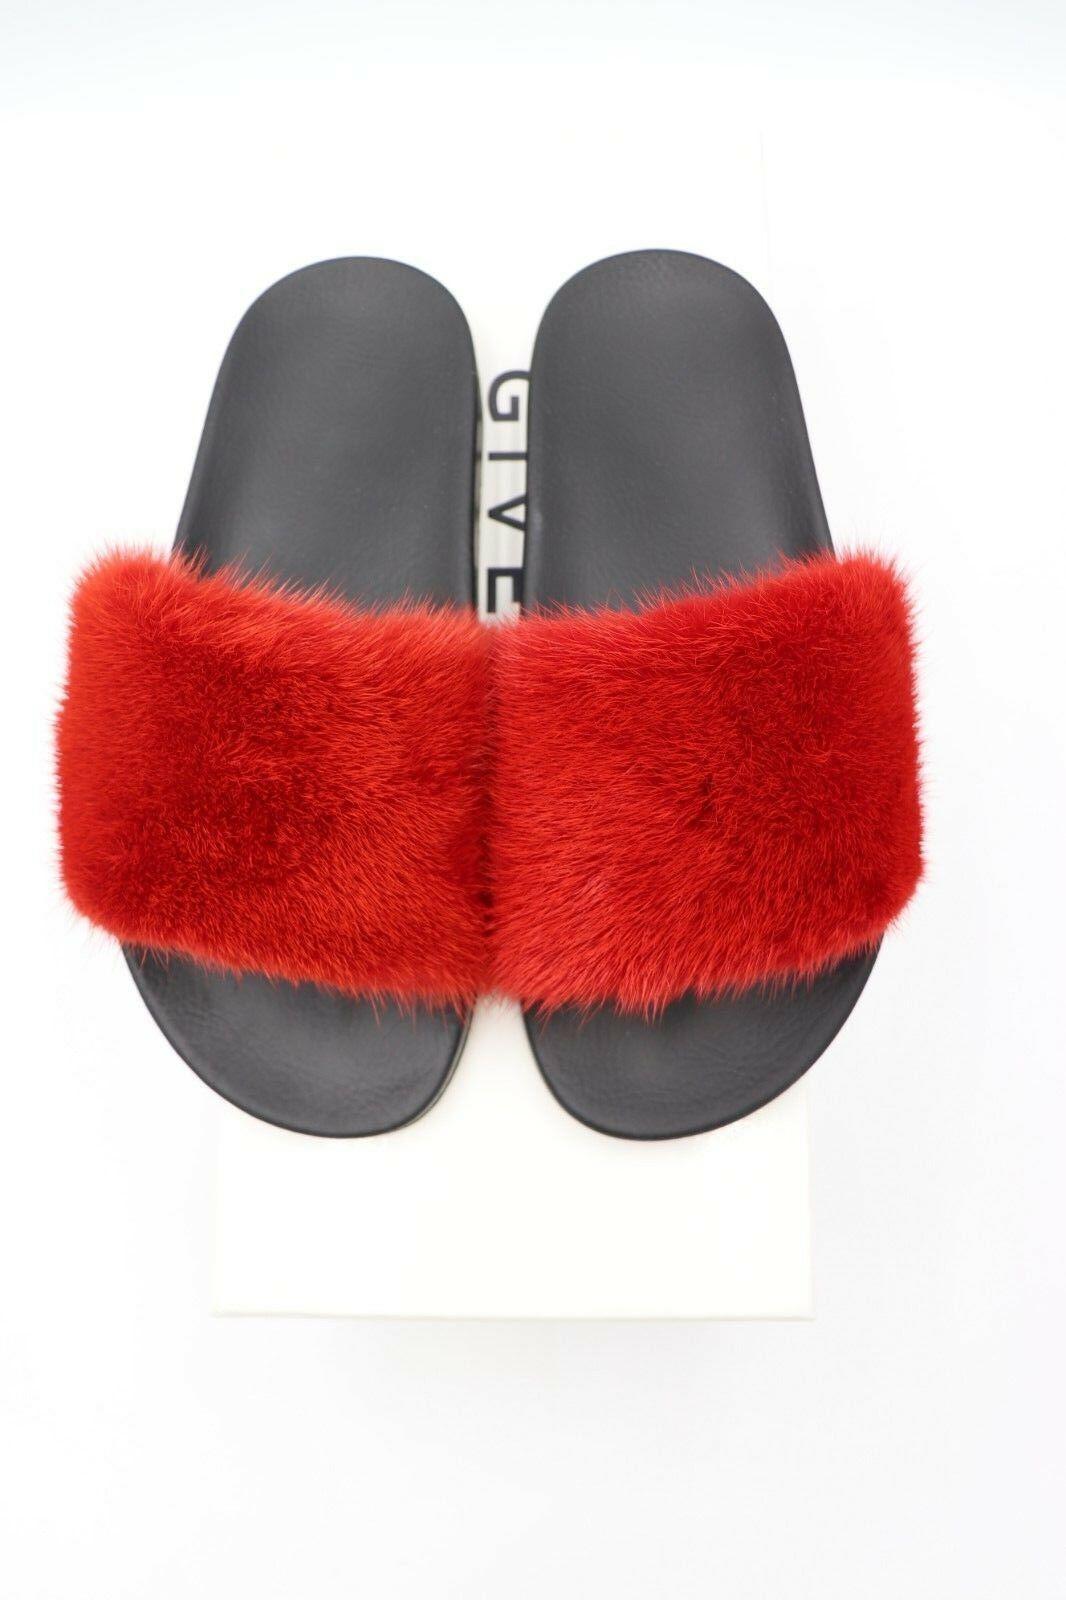 NIB GIVENCHY Paris Red Mink Fur Slide Sandals Flats New 7 37  $595